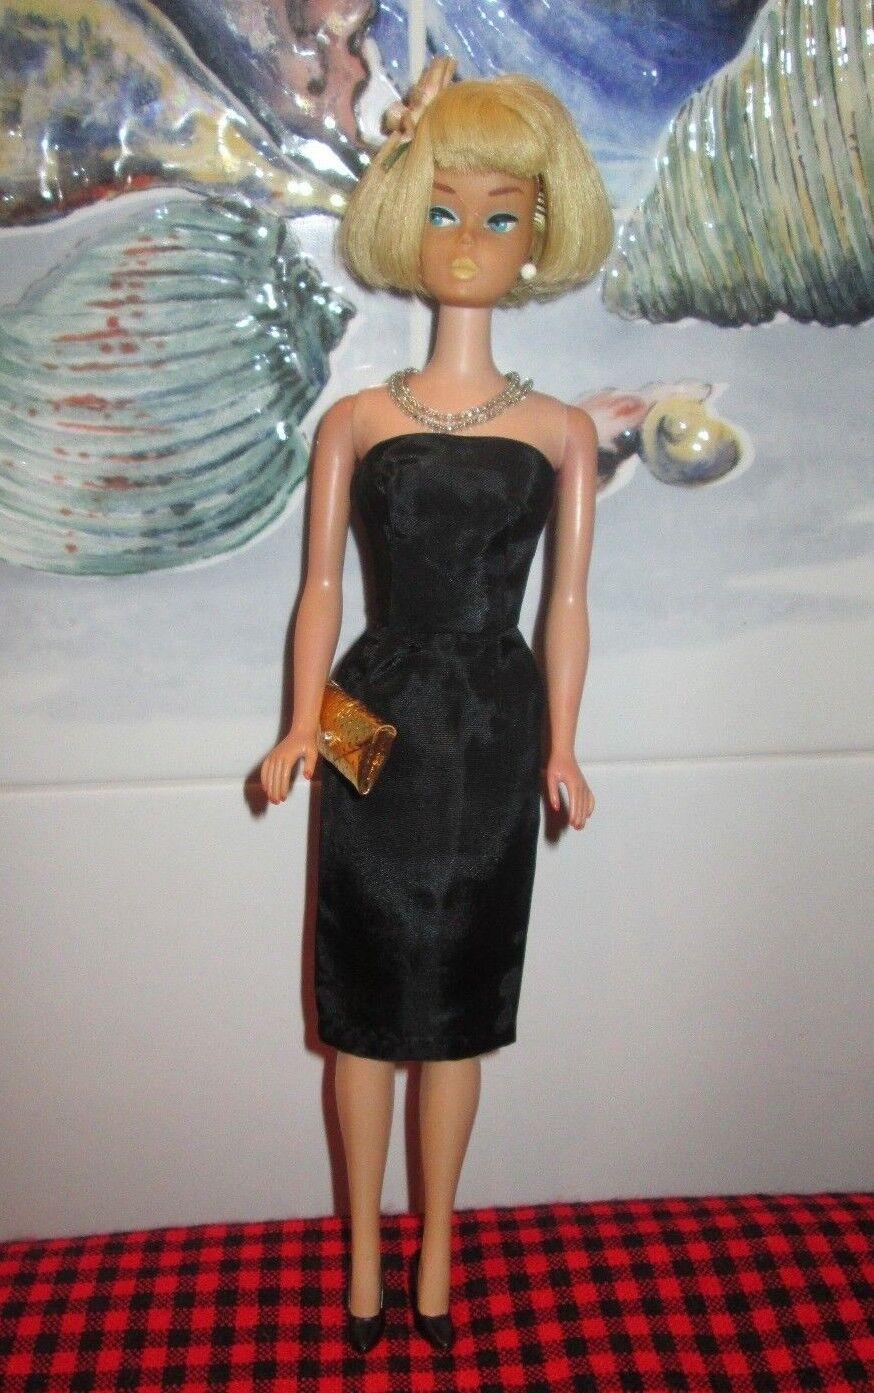 1965 JAPAN AMERICAN GIRLORIGINAL NR.MINT PLATINUM BARBIE1070schwarz SILK OUTFIT